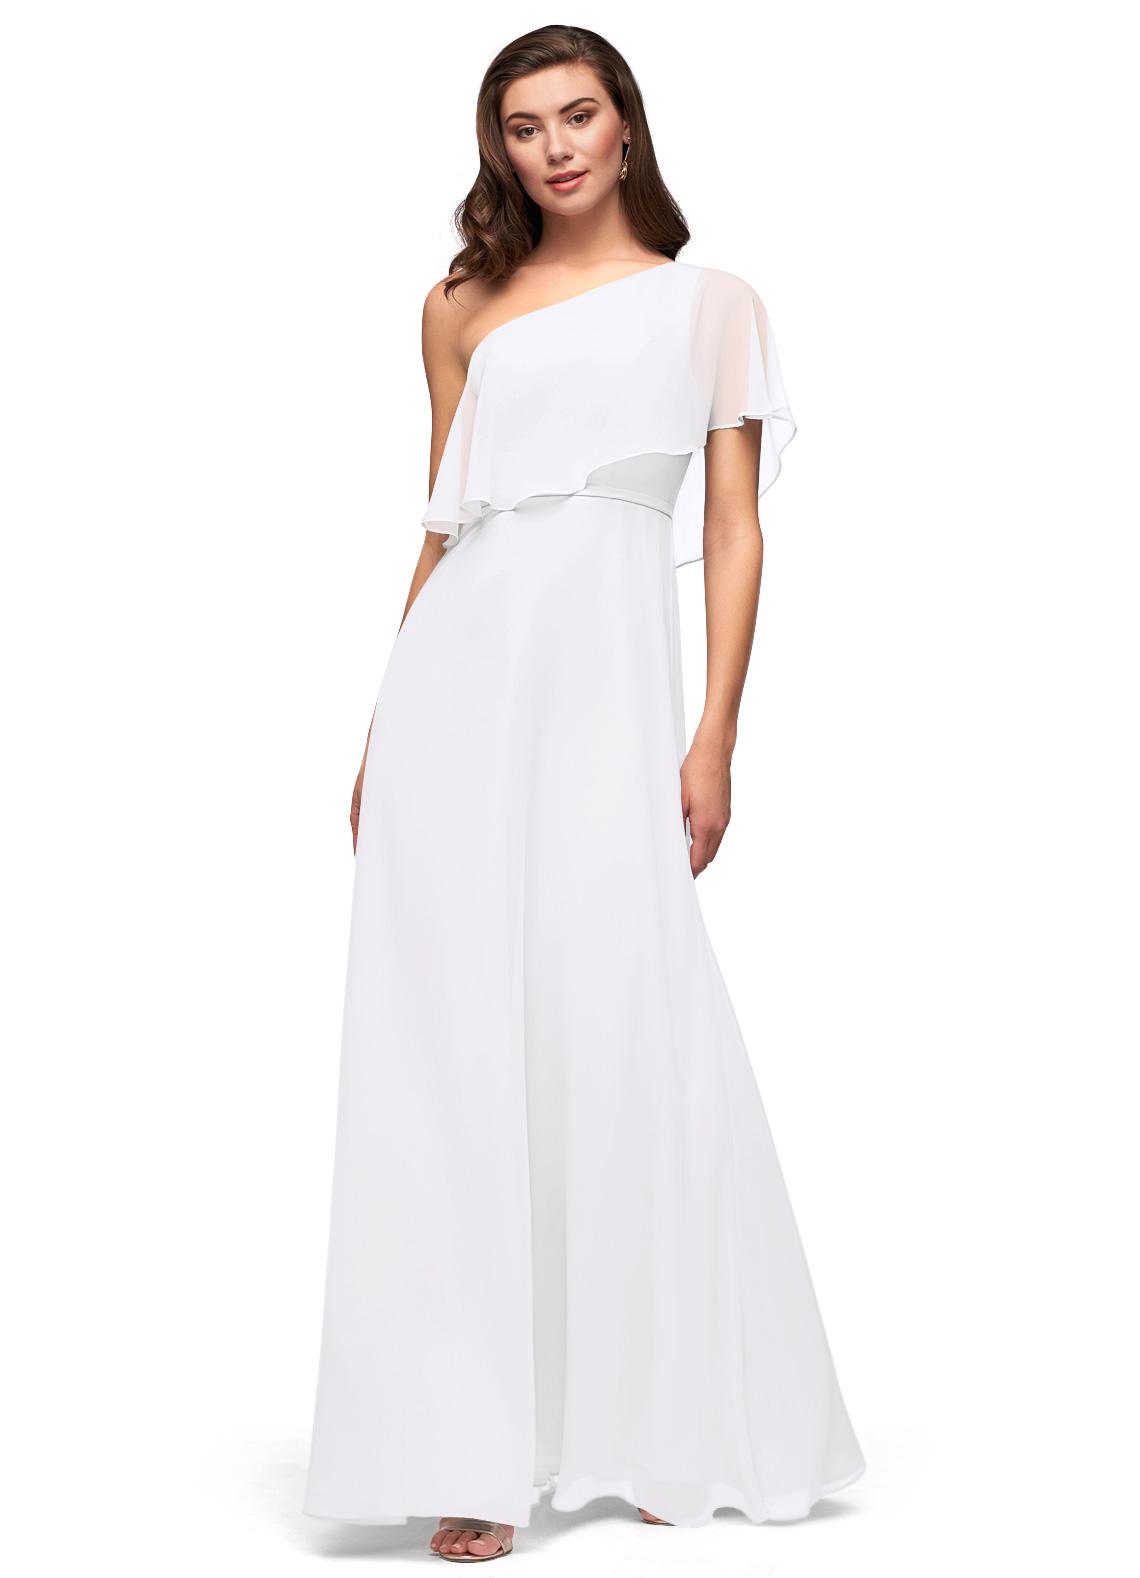 Azazie Lizzy in white